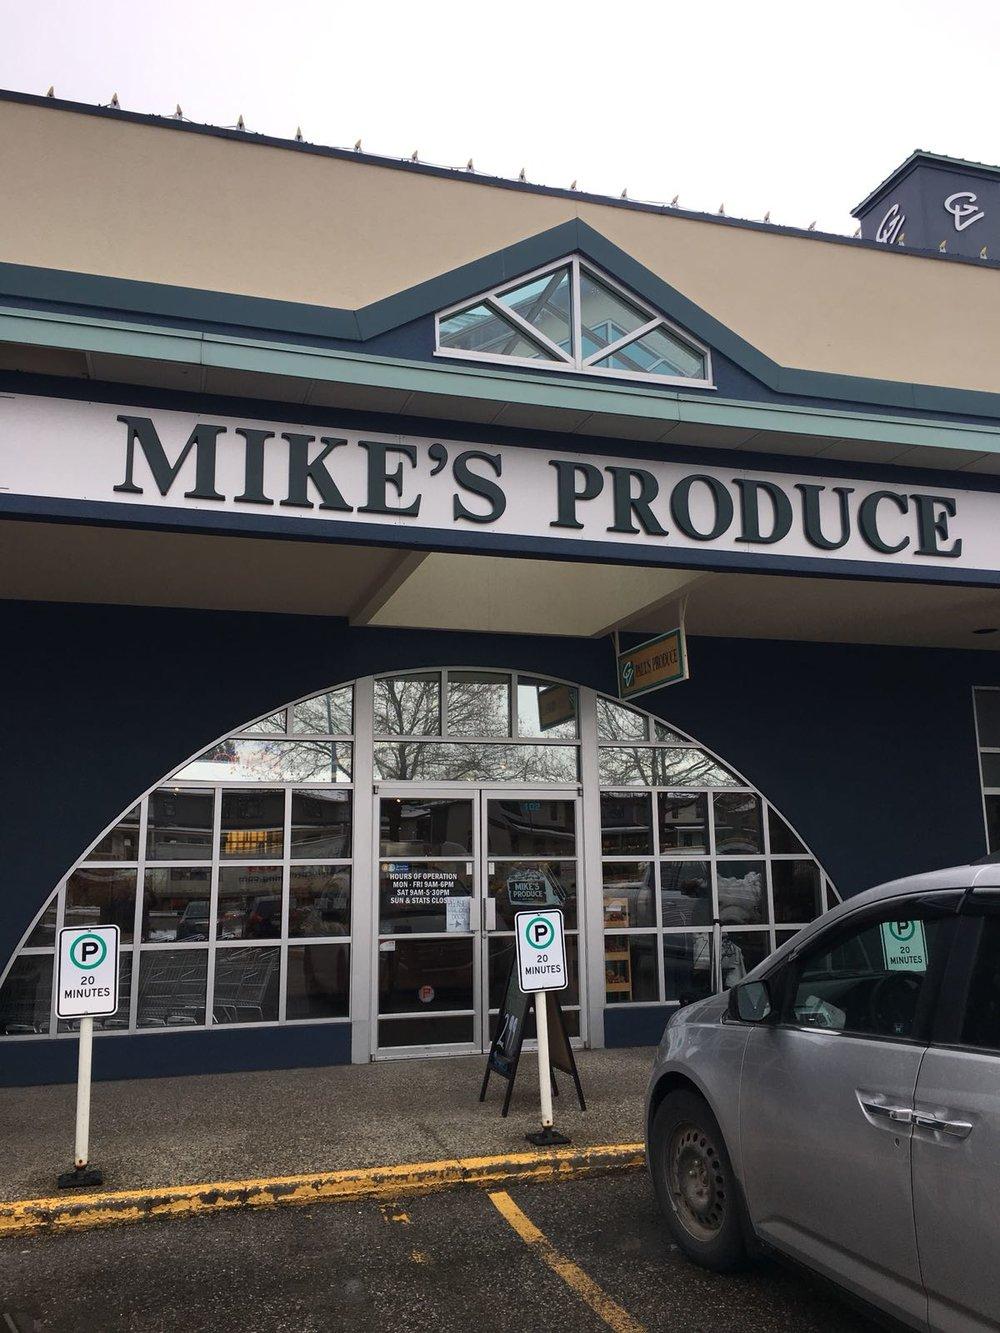 Mikes produce_Exterior 2.jpeg